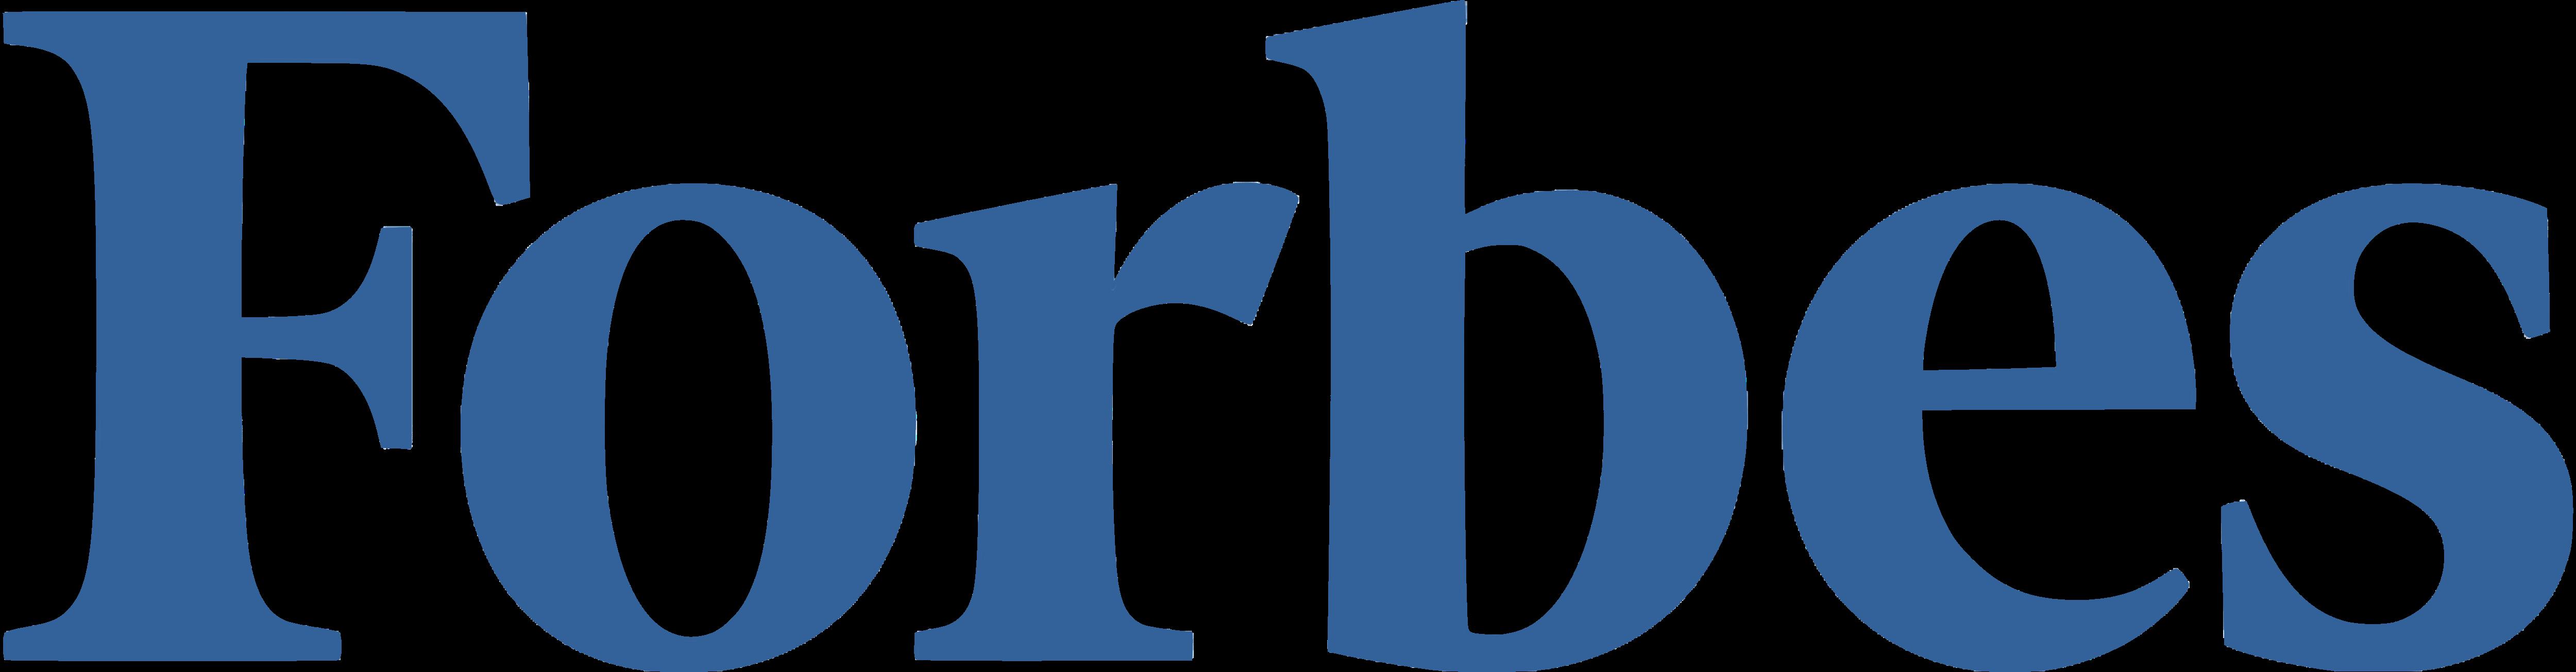 Forbes_logo2